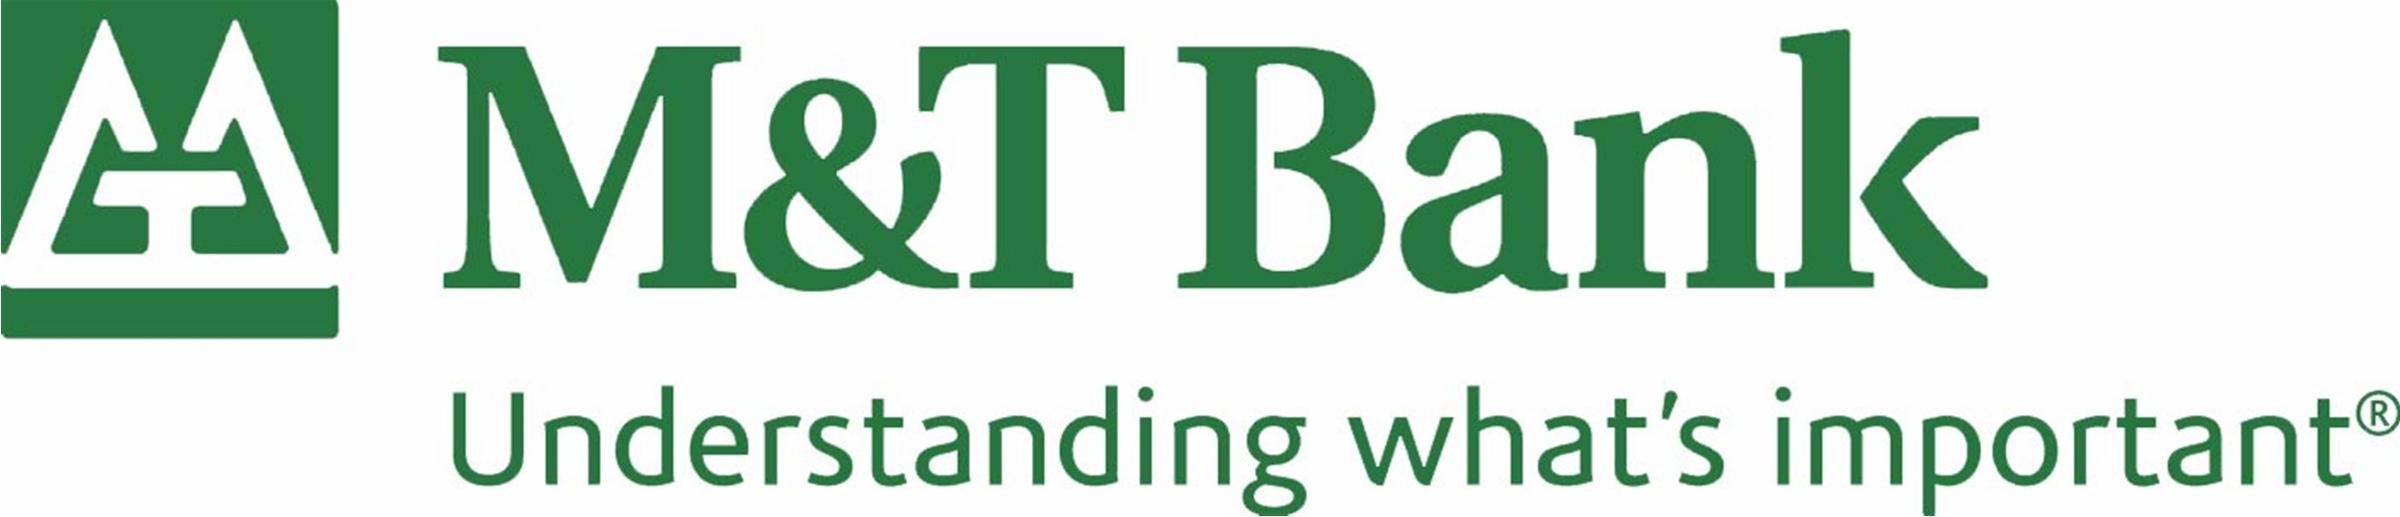 business debit cards atm custom debit cards m t bank